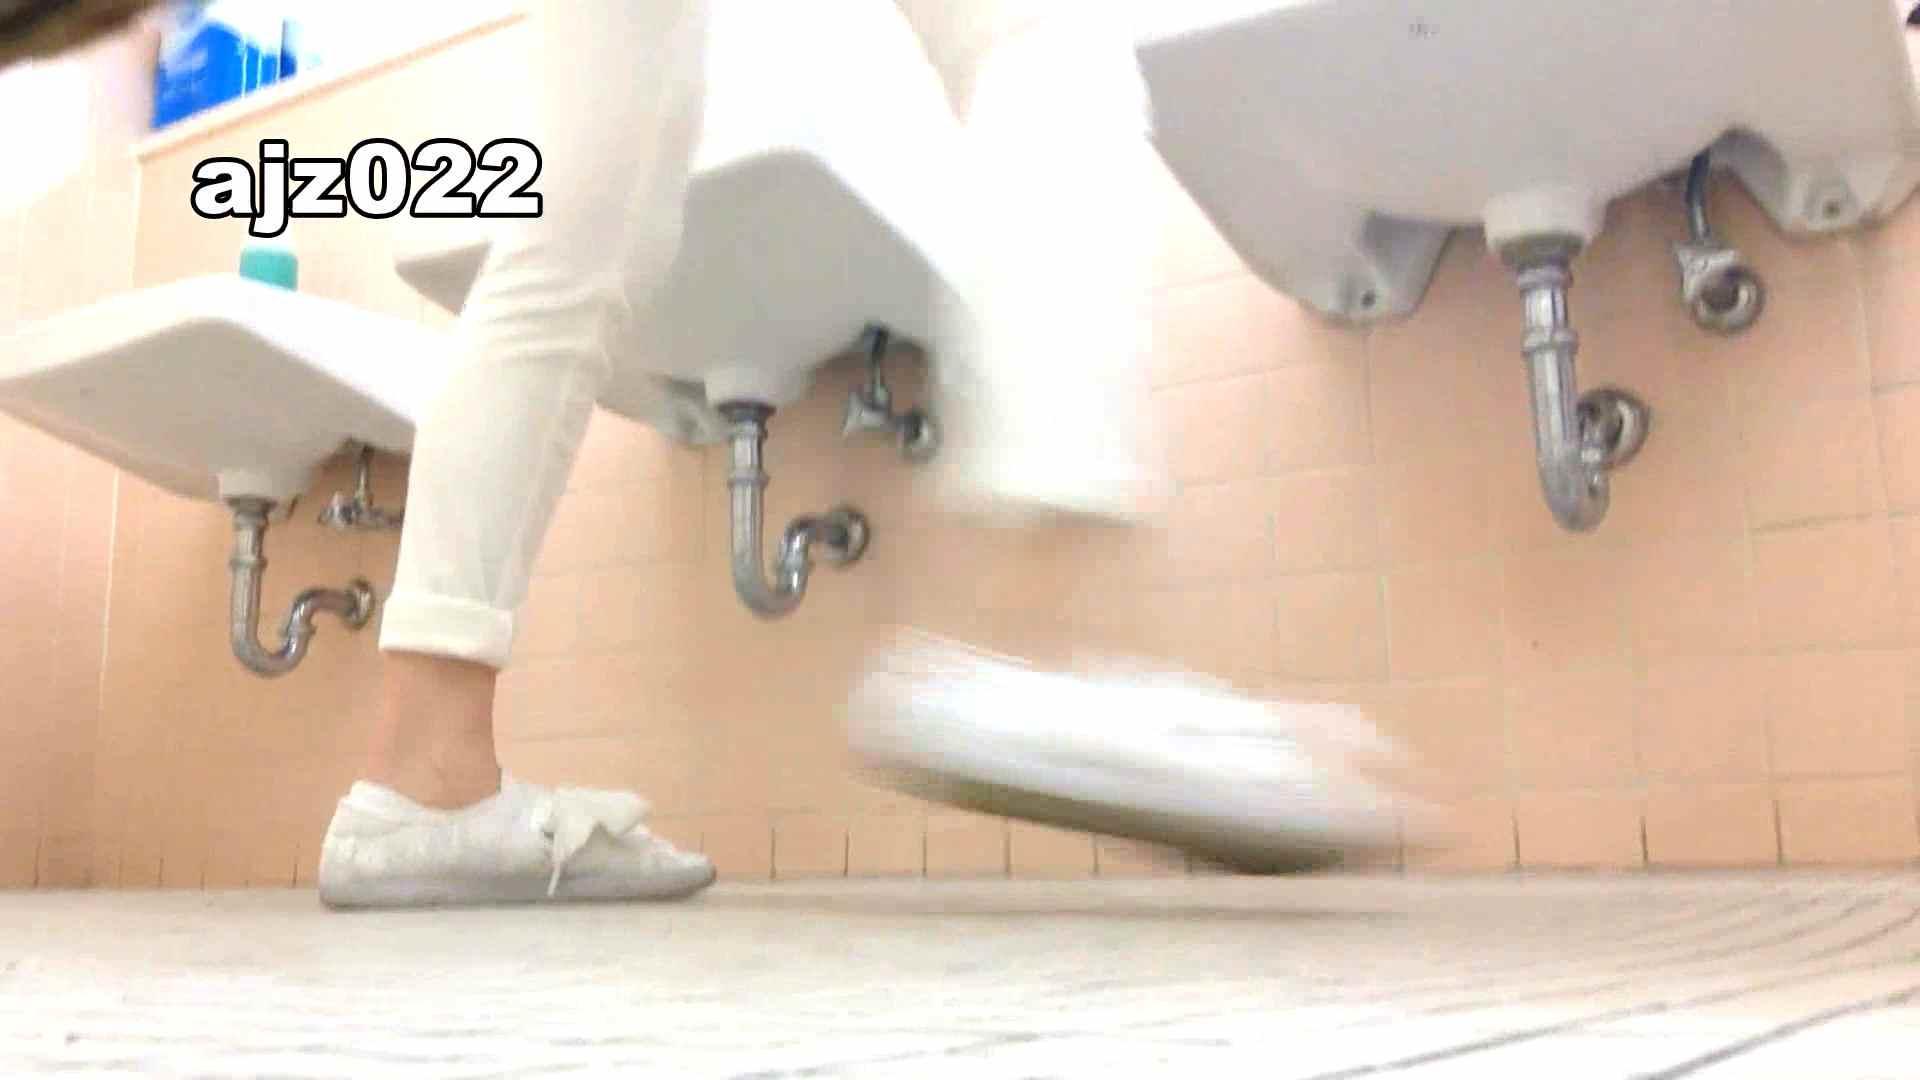 某有名大学女性洗面所 vol.22 洗面所突入 おめこ無修正画像 107pic 58